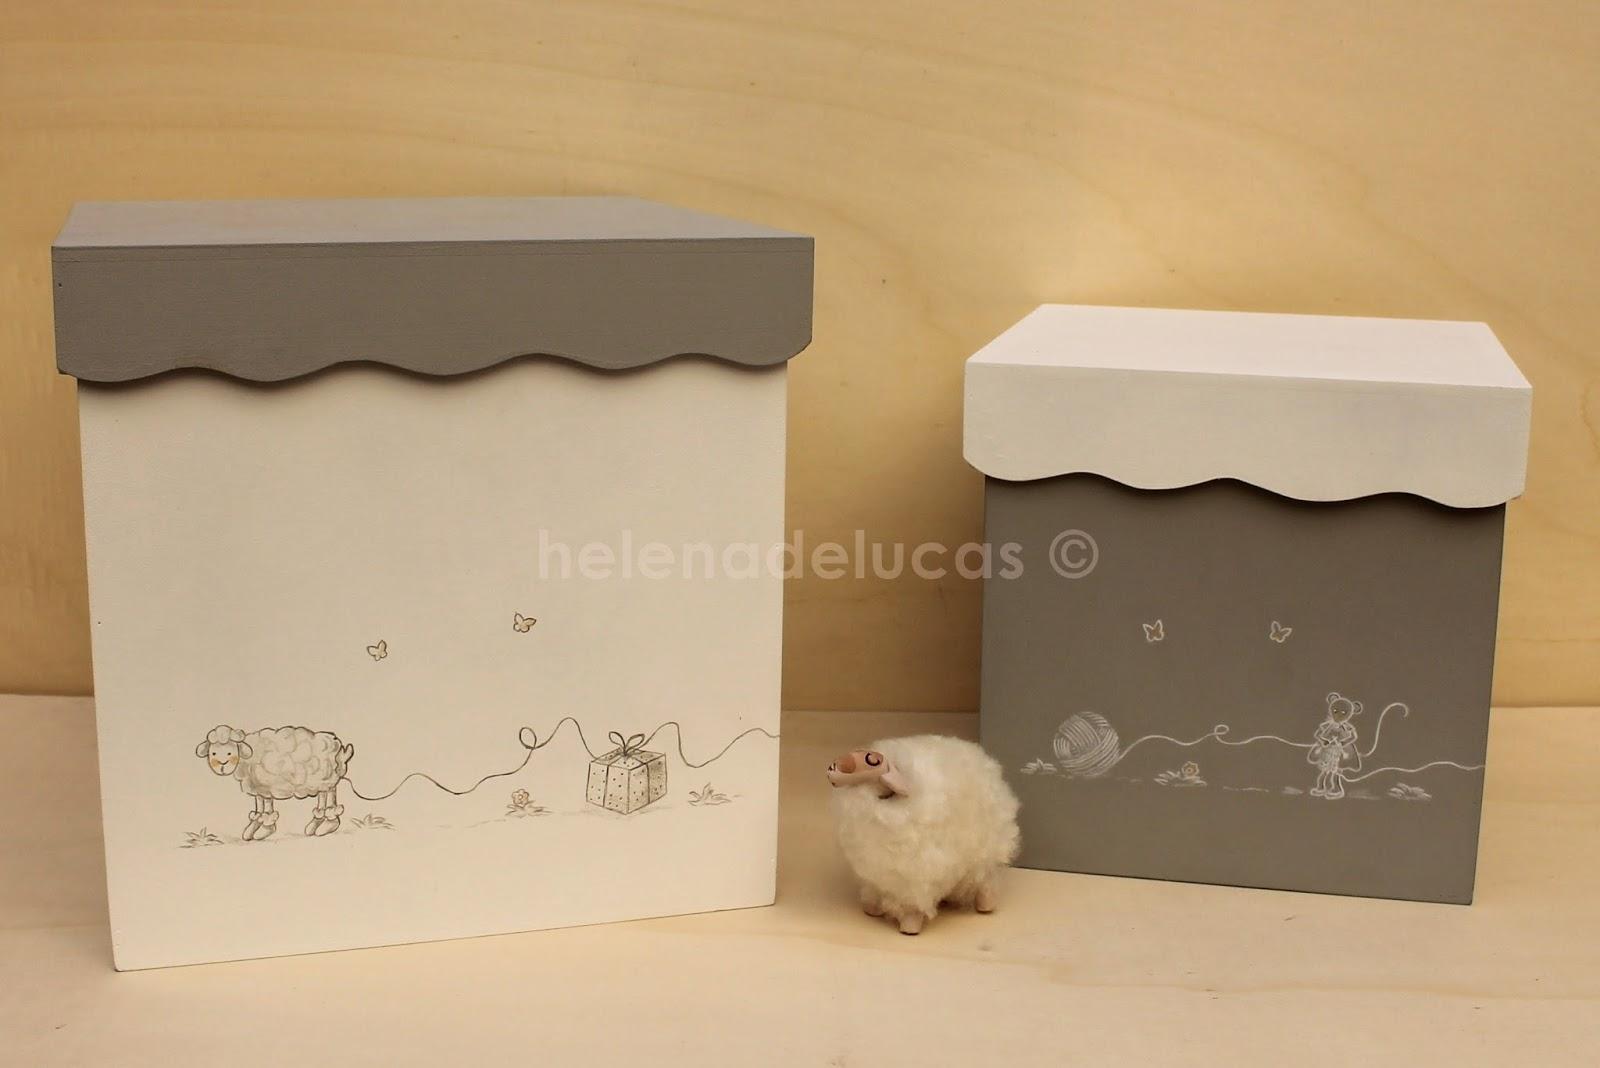 Helenadelucas cajas de madera infantiles decoradas - Cajas de madera decoradas ...